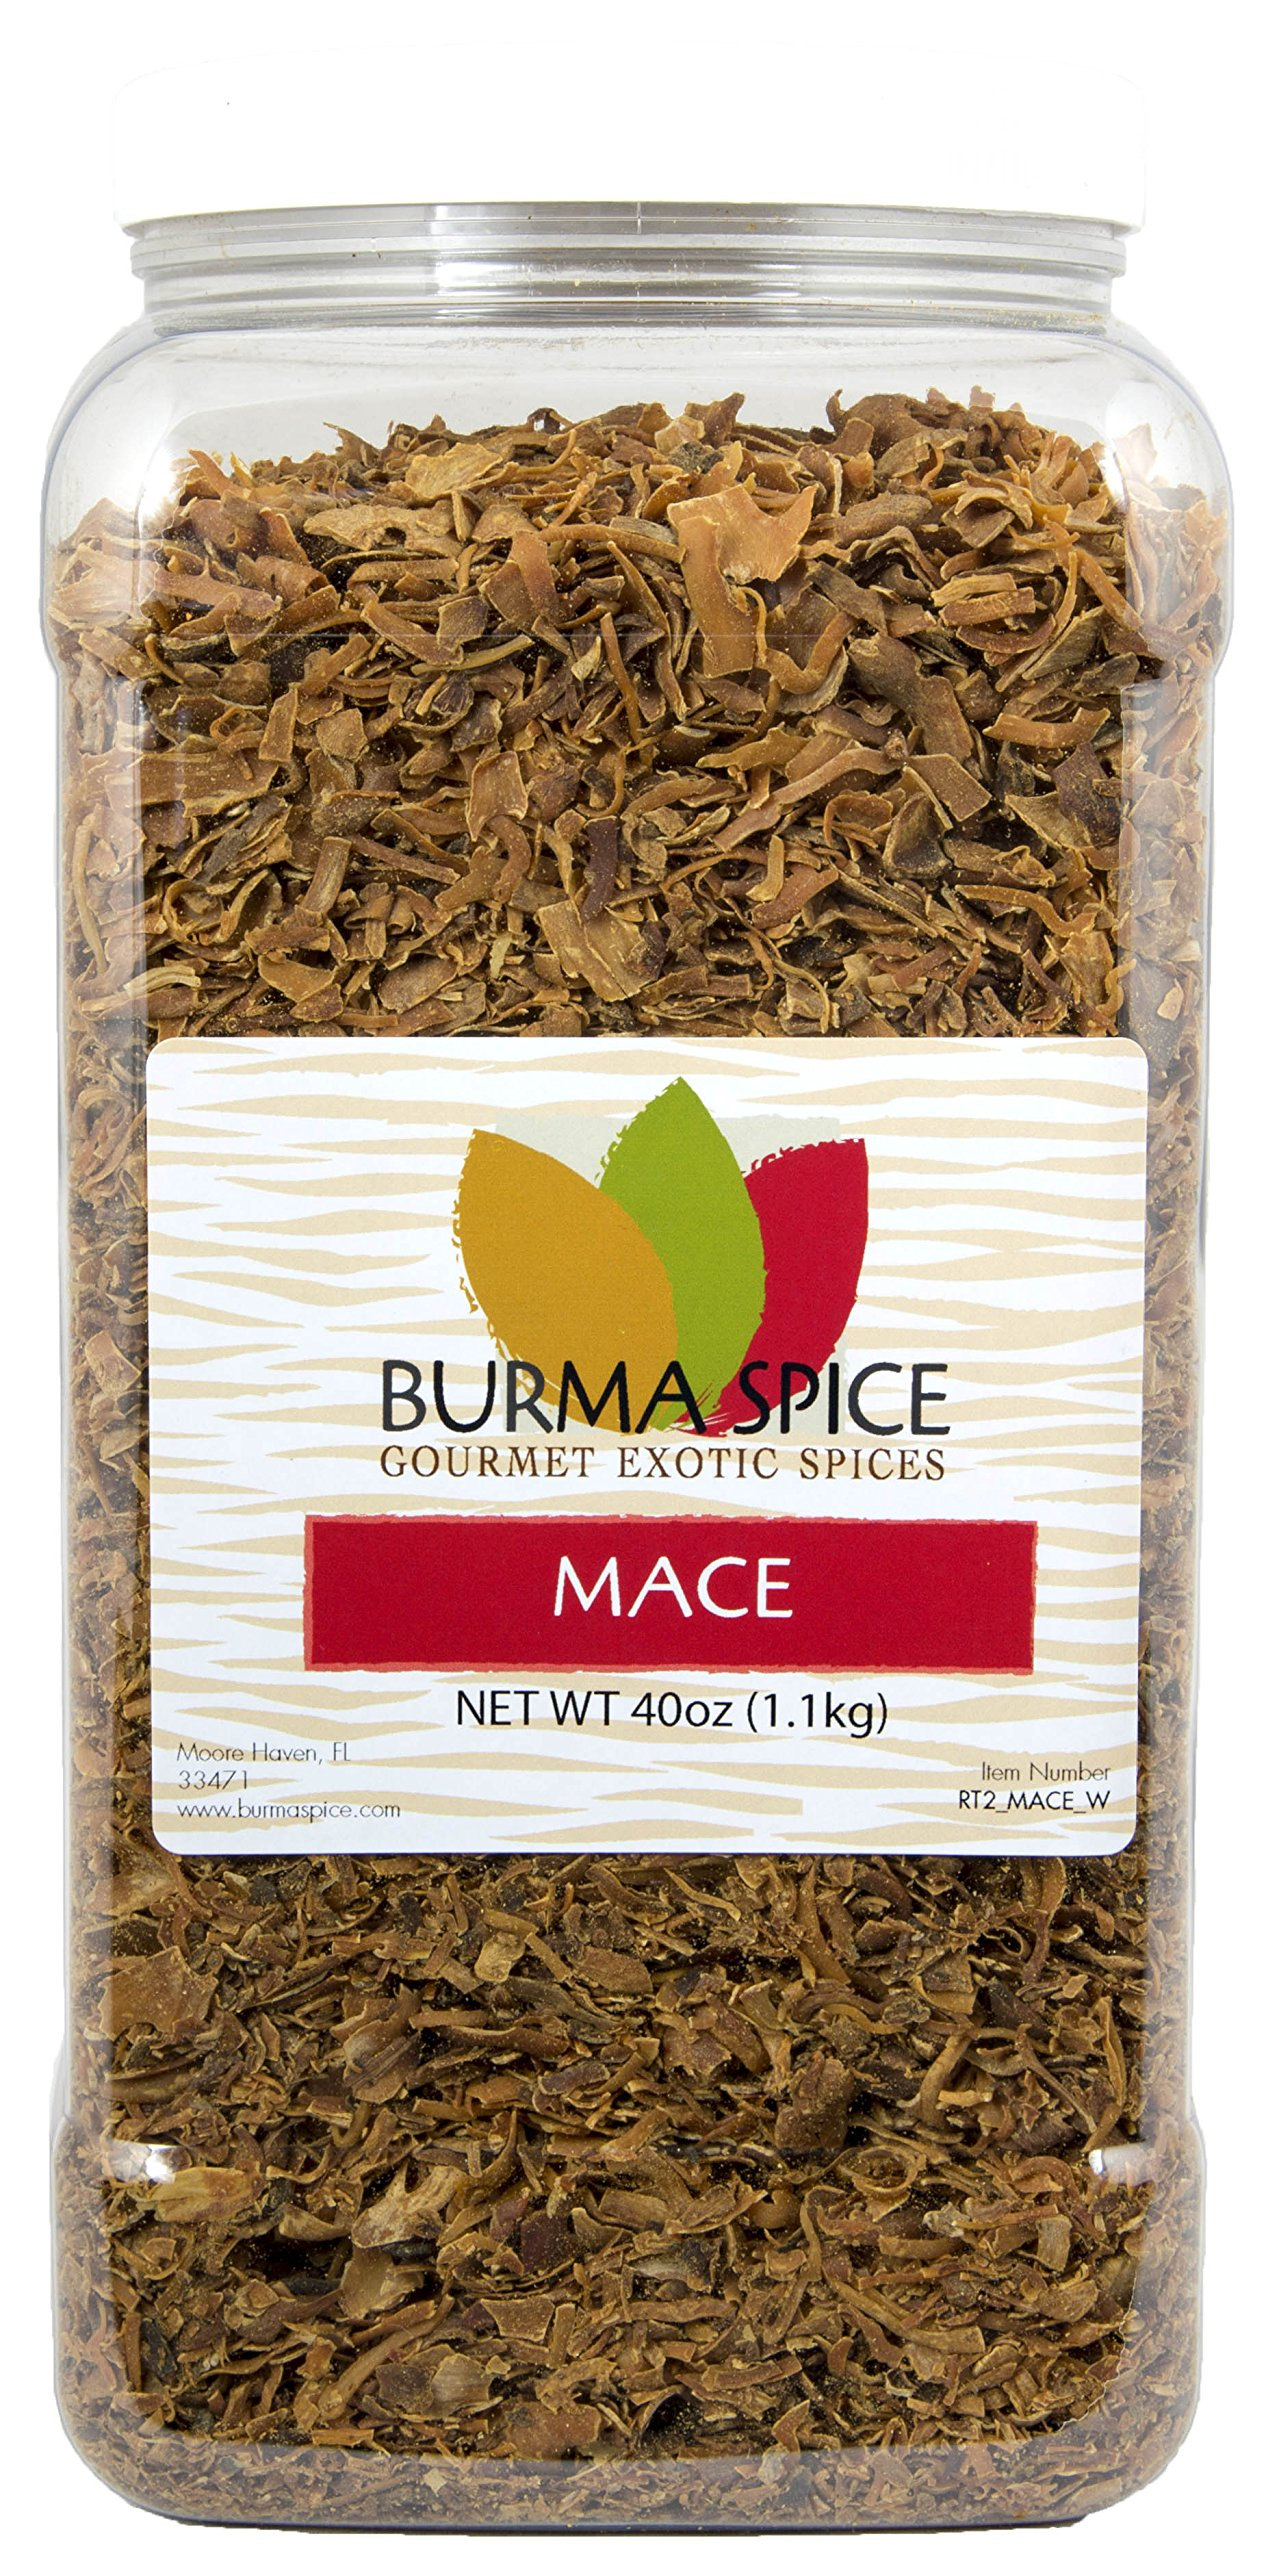 Blade Mace (Javathri) Natural Aromatic Pure Loose Herb Spice Kosher (40oz.)